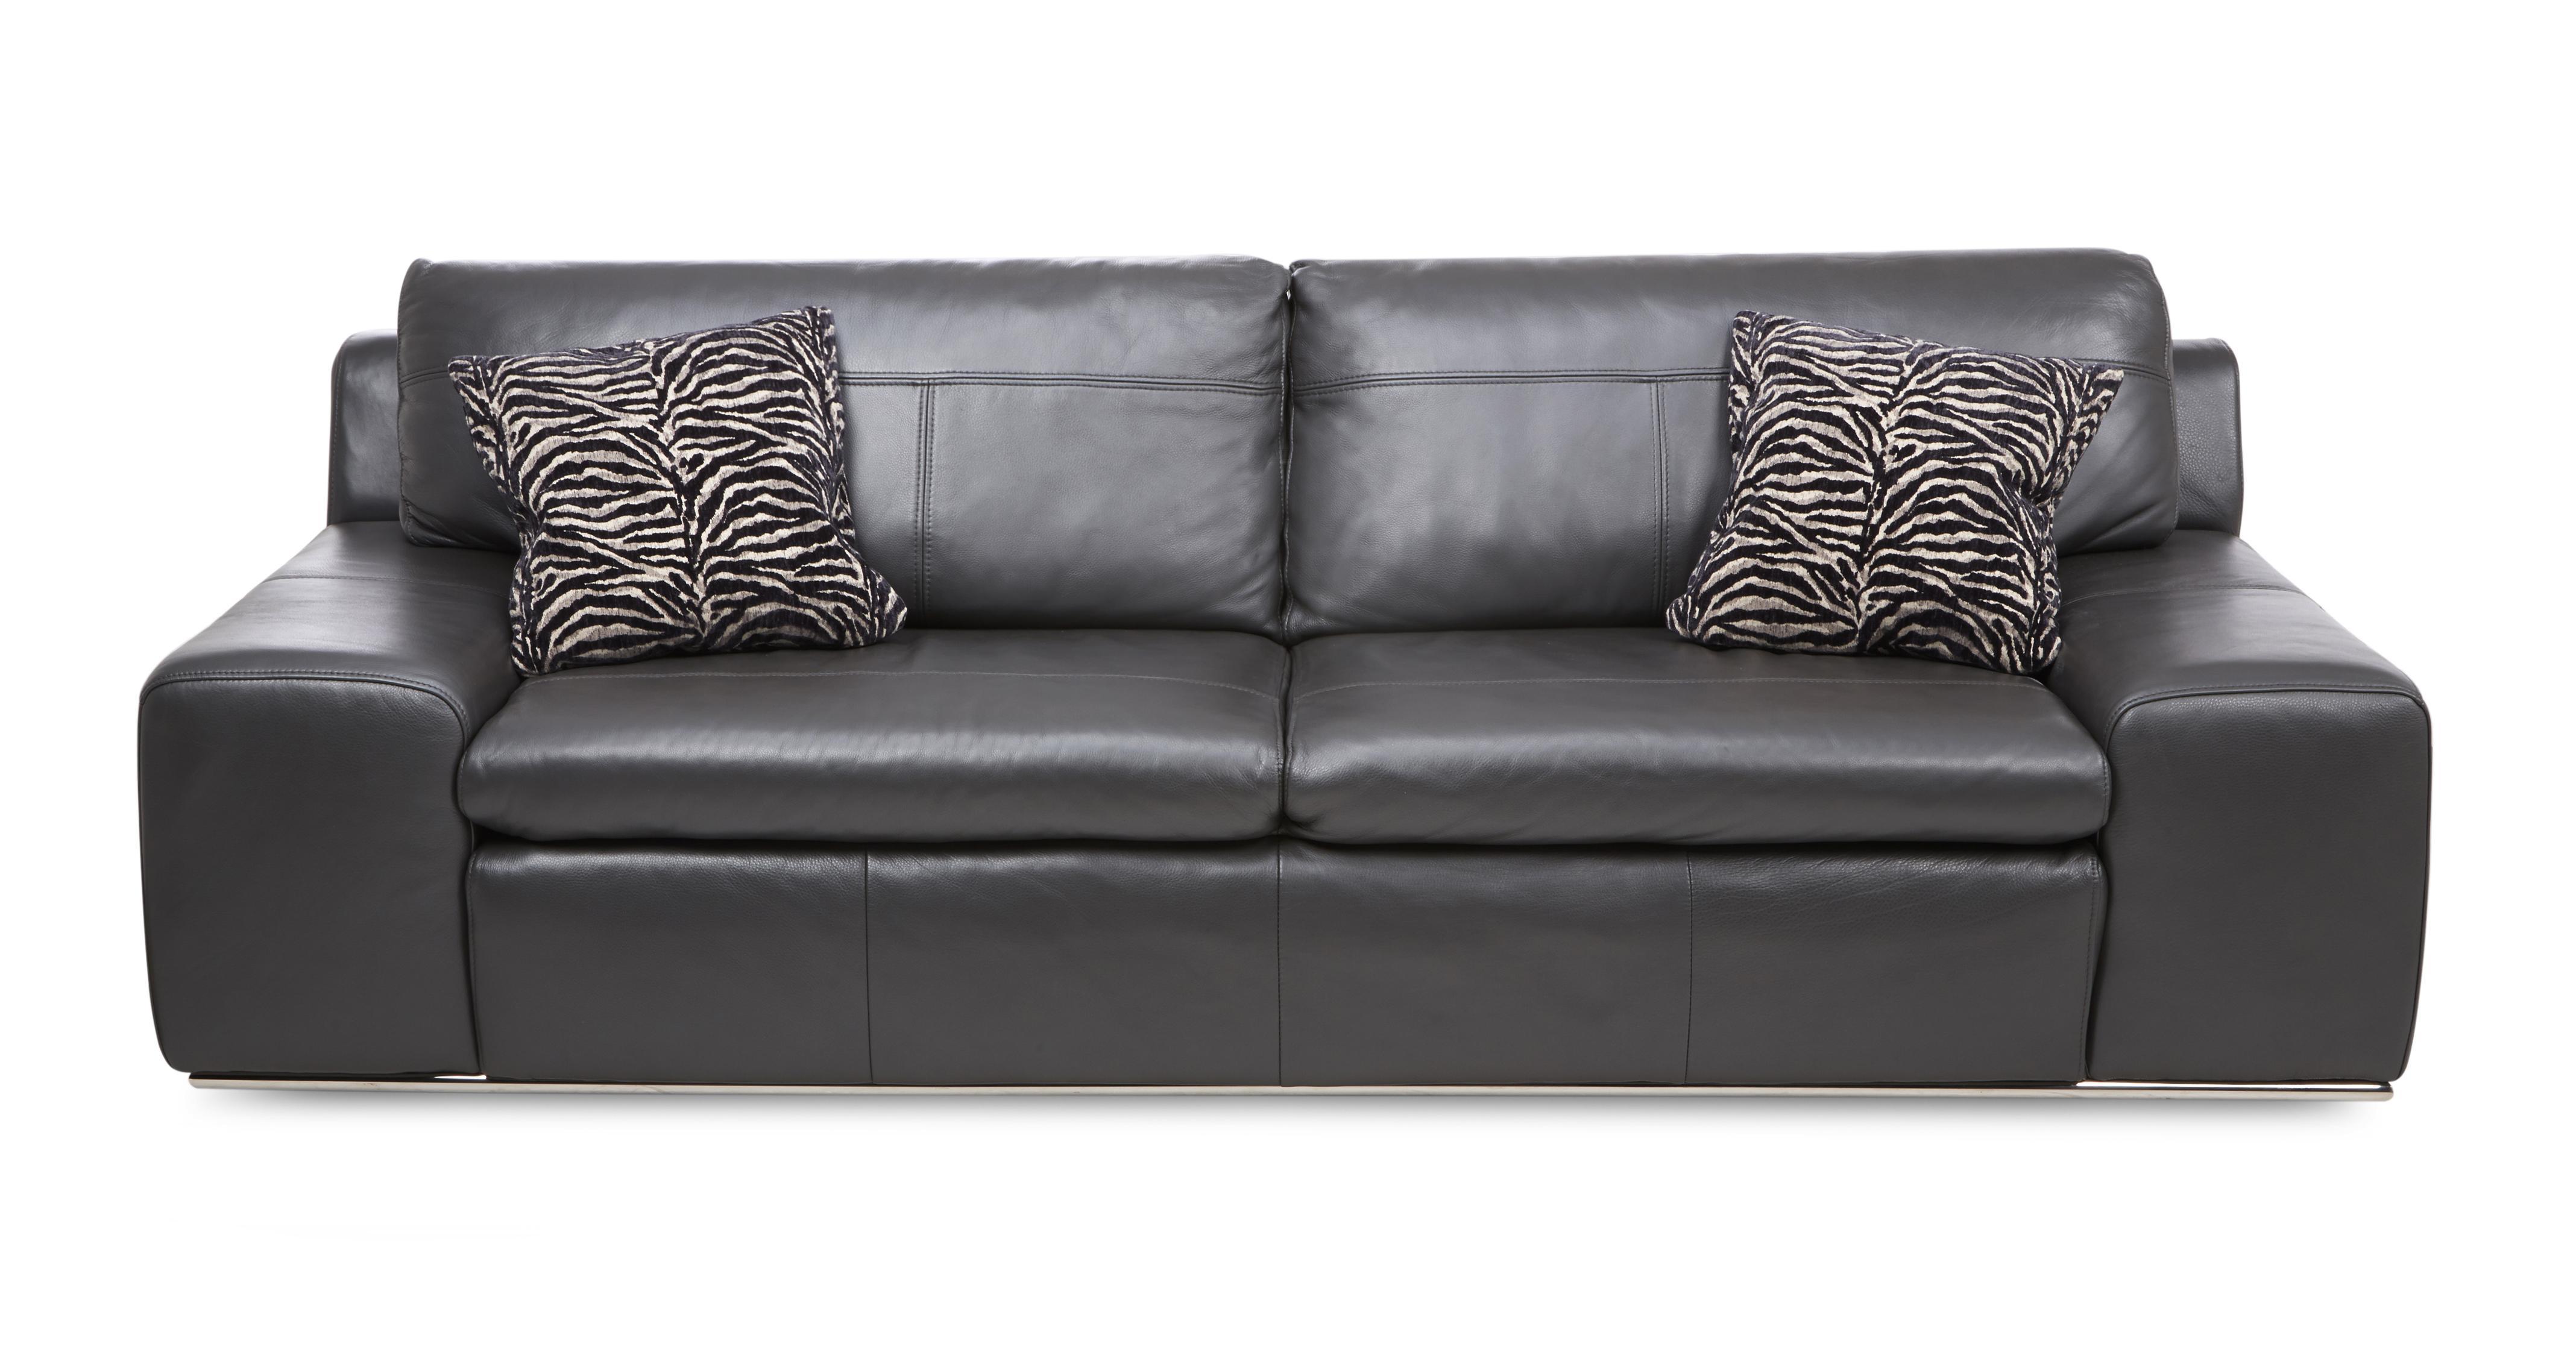 3 seater leather sofa dfs redondo area externa palladium fuse